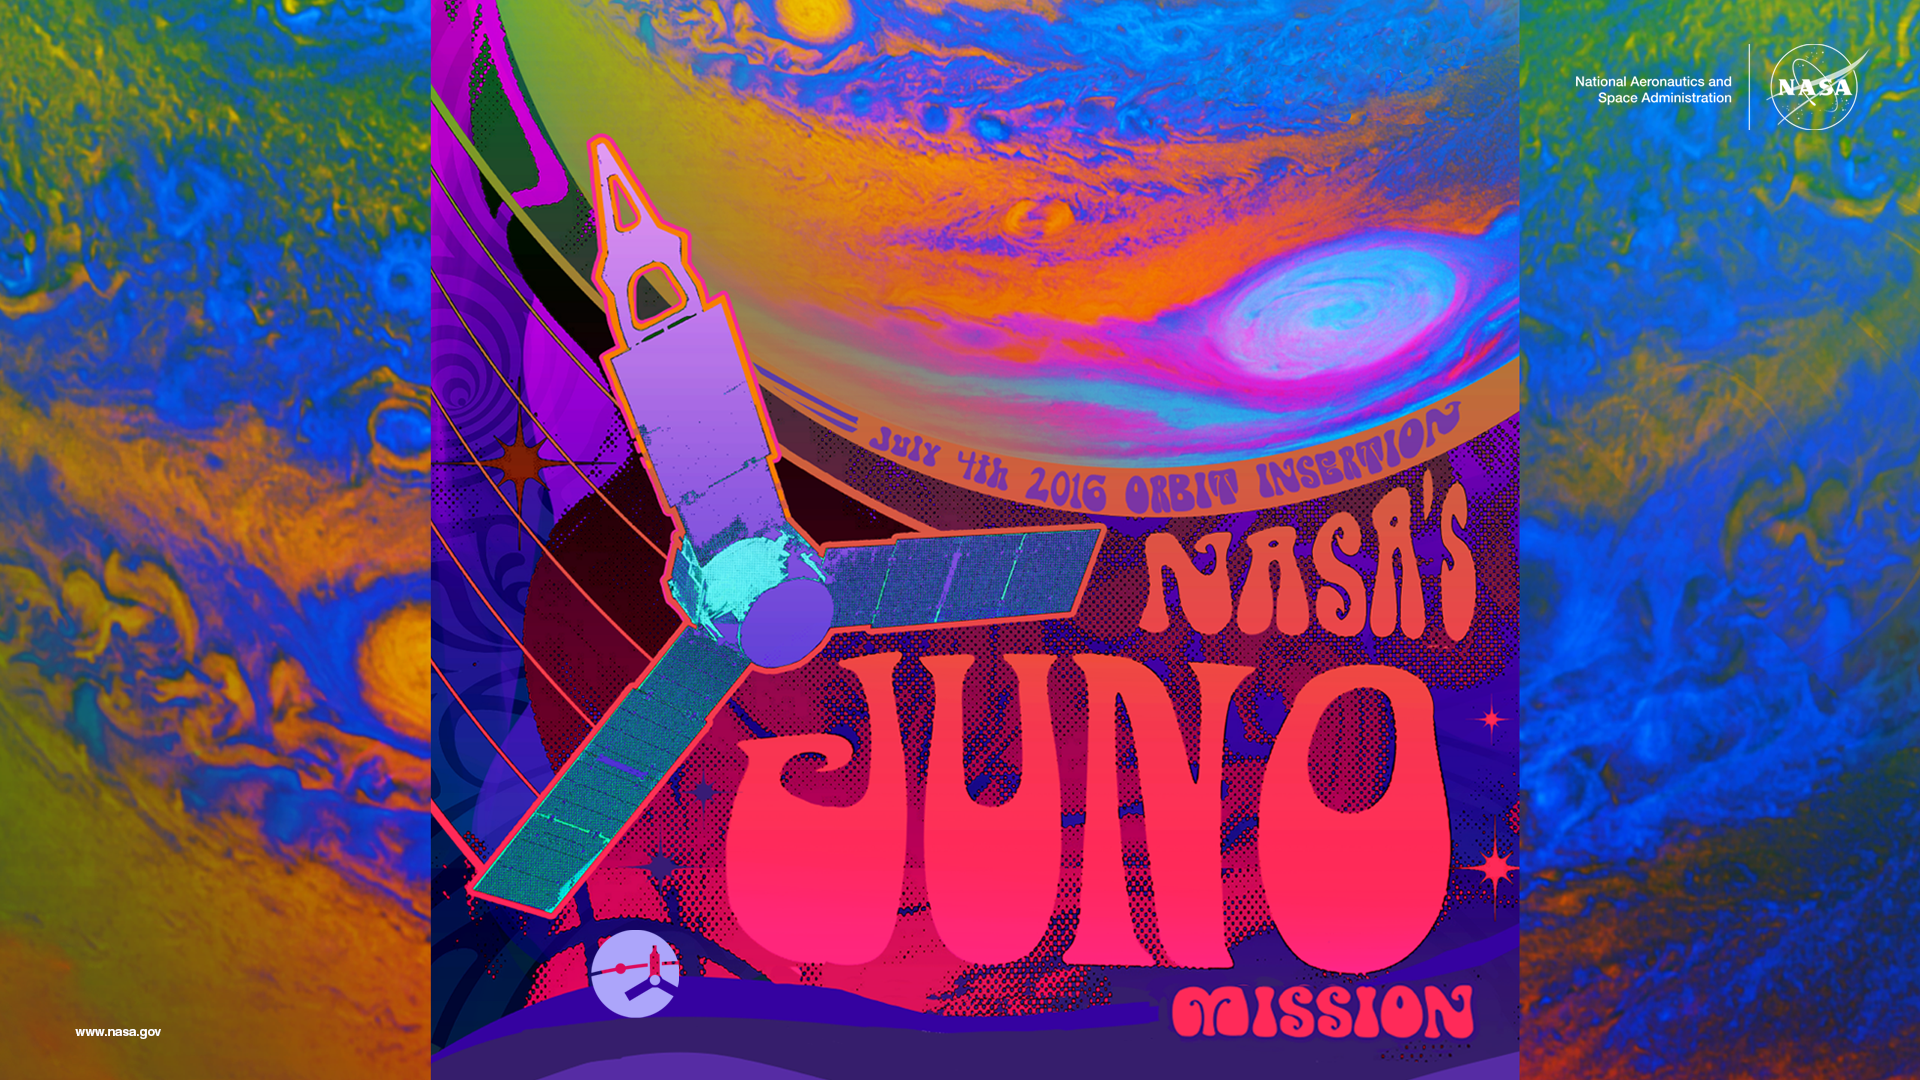 juno_psychedelic_desktop_background_version_2_1920x1080.png